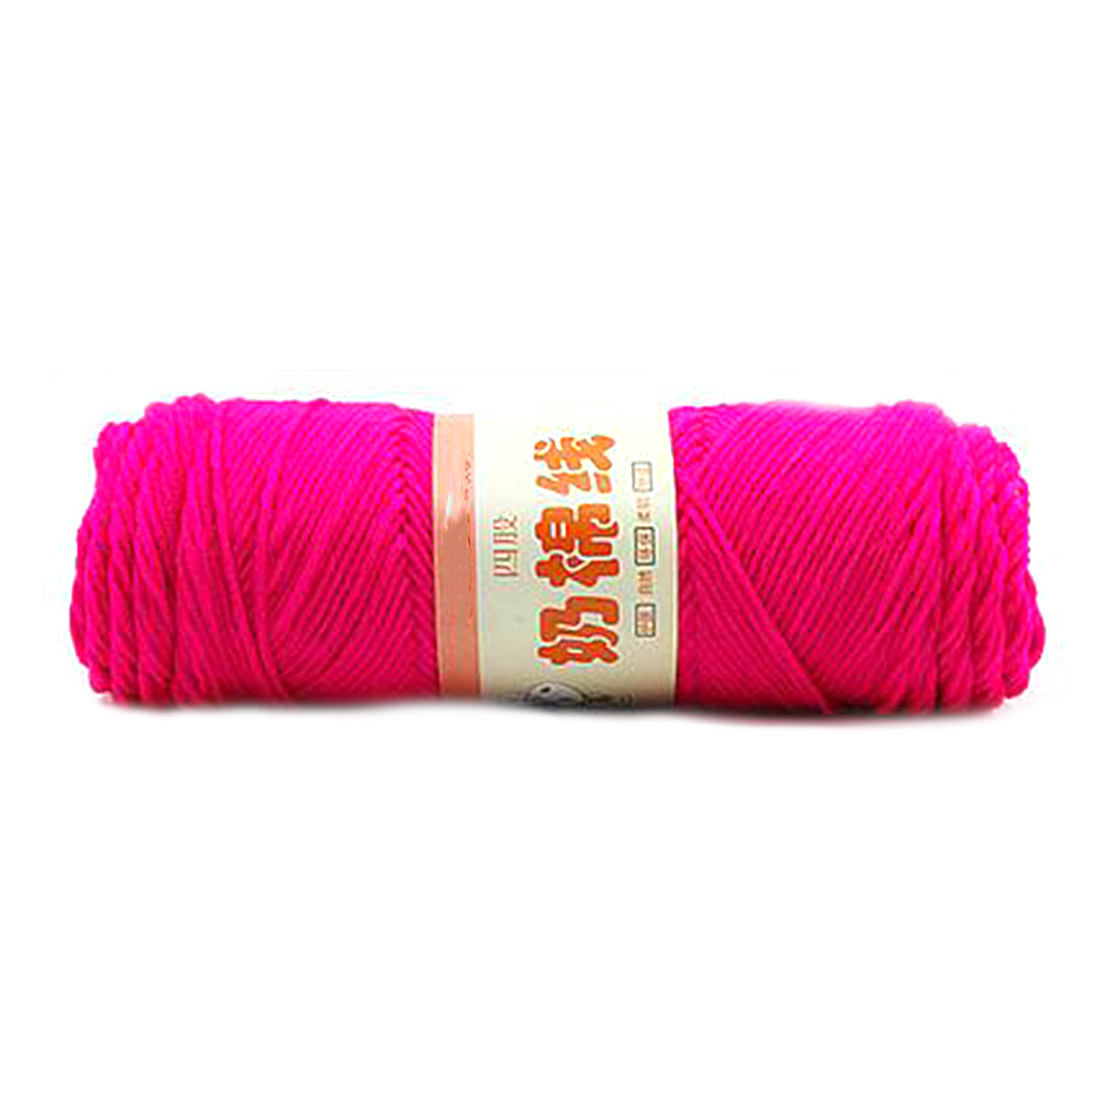 Пряжа для вязания крючком 46